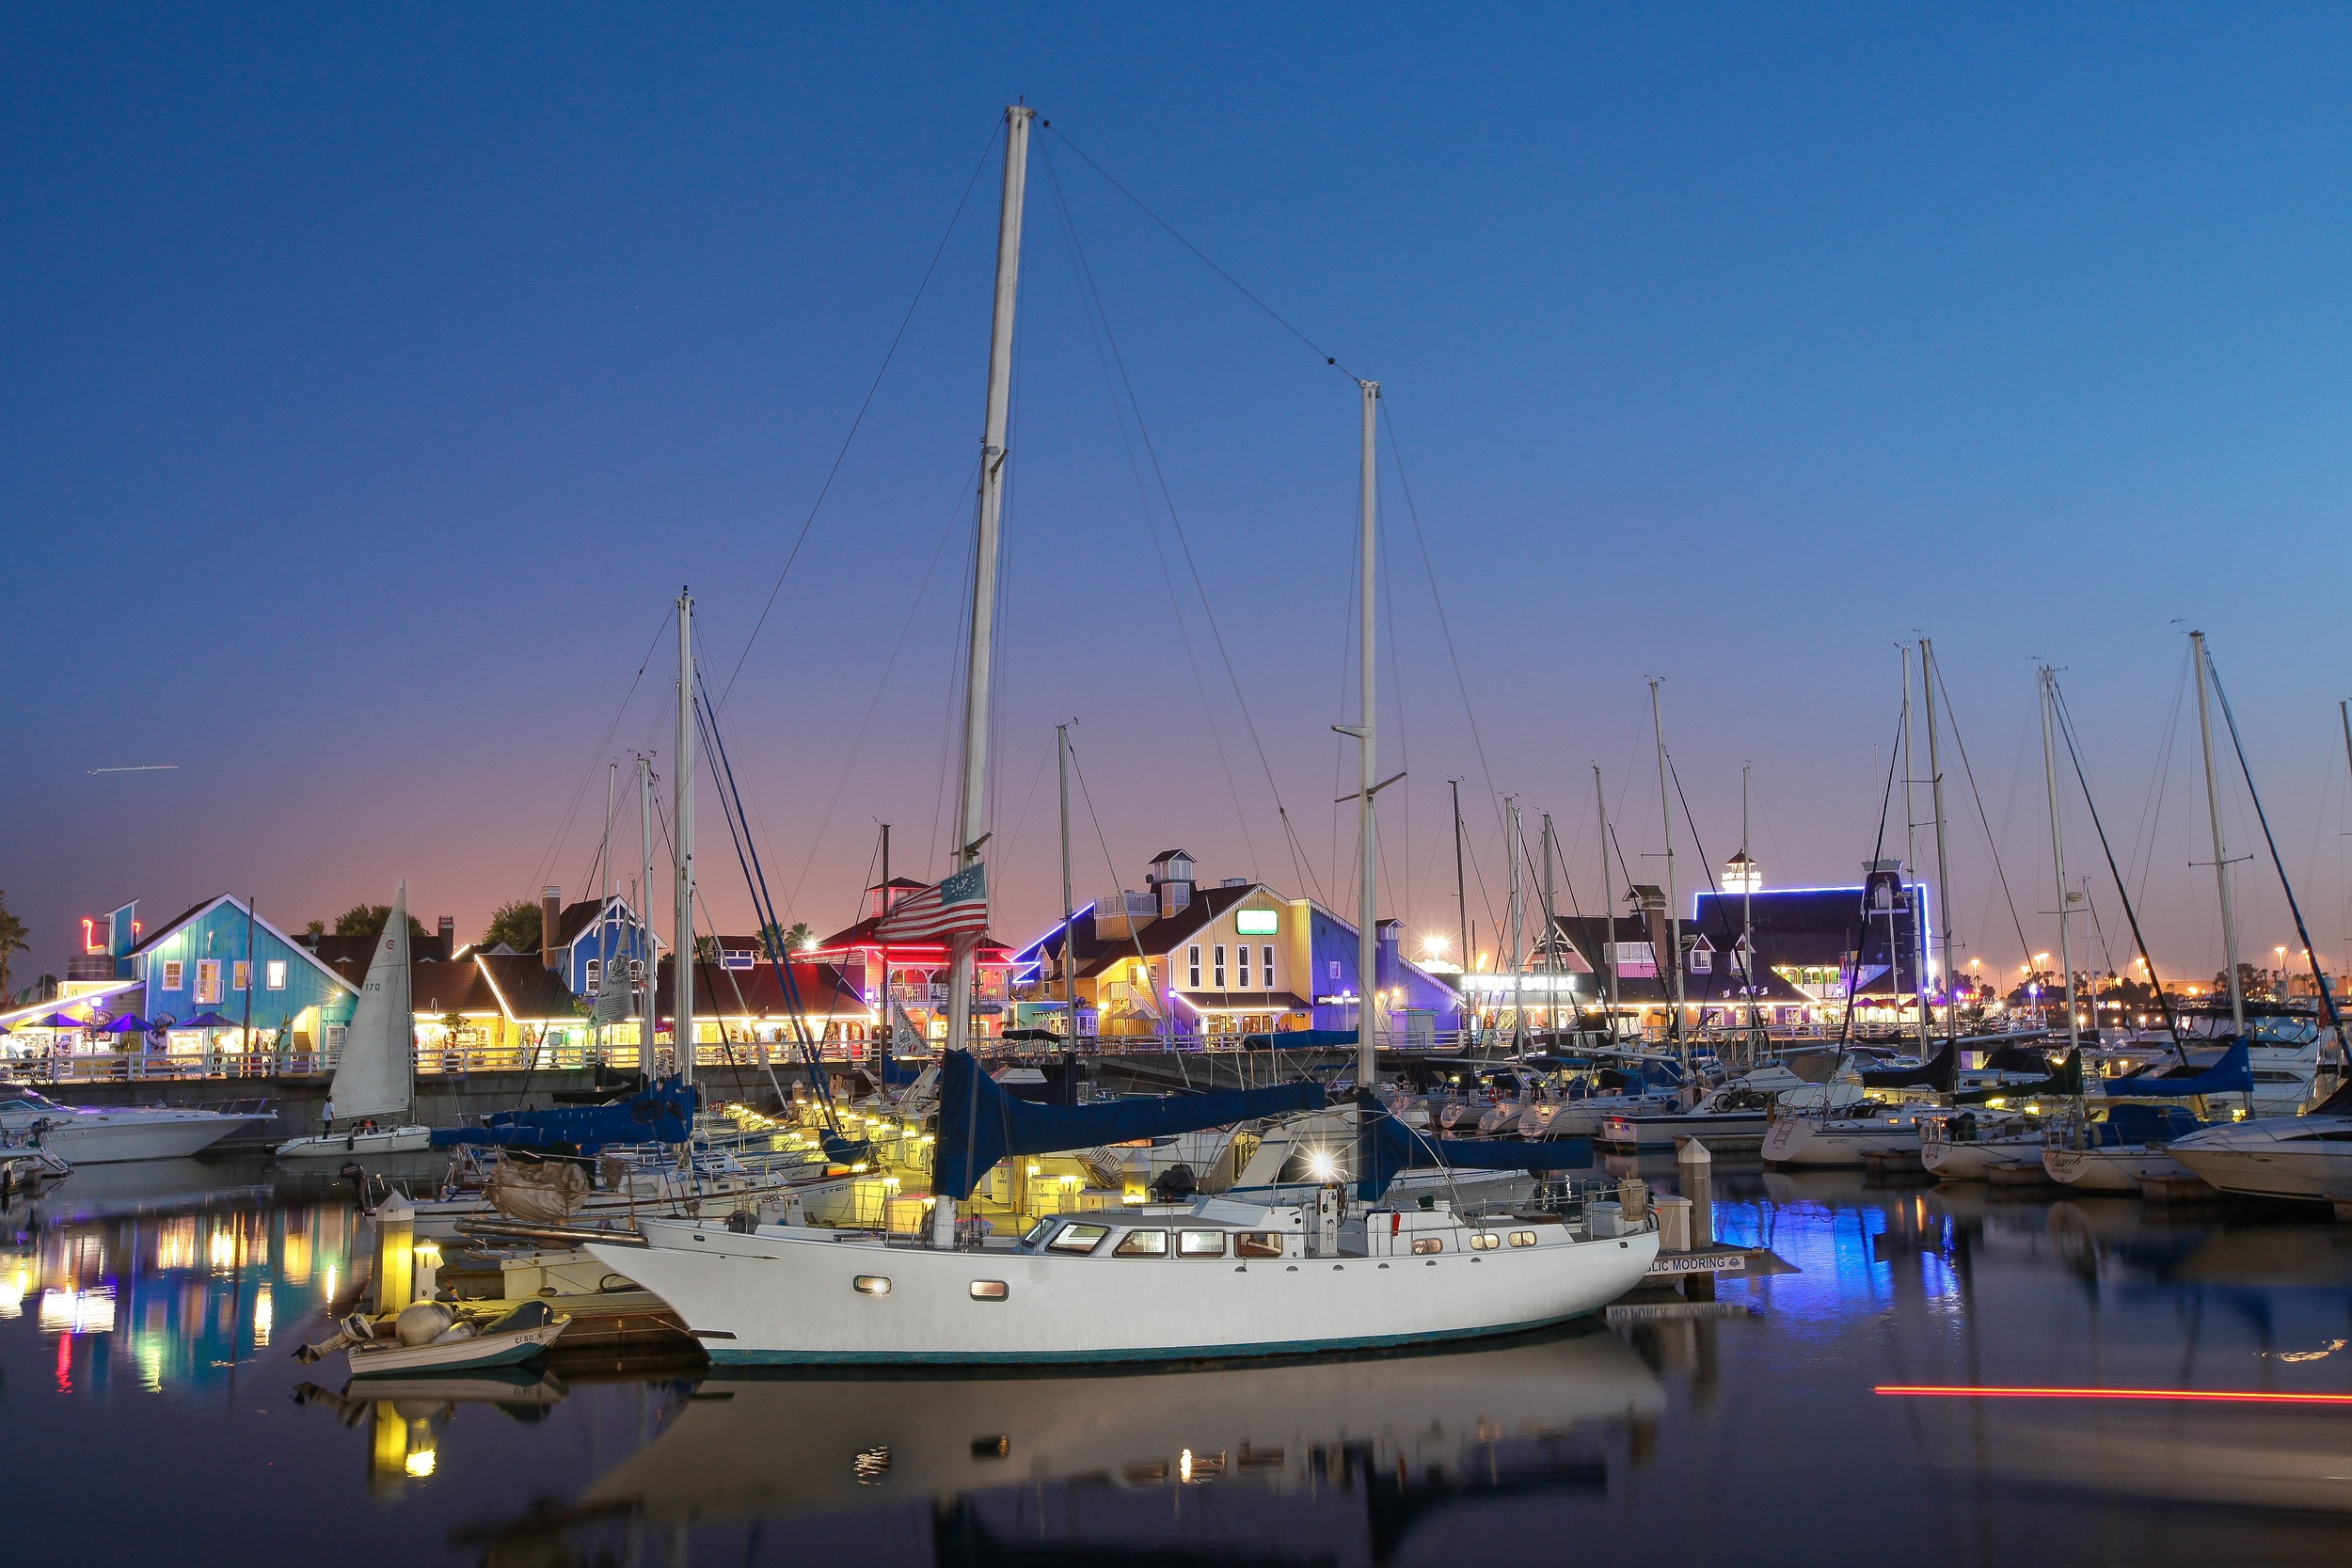 Sunglow Charters Dock